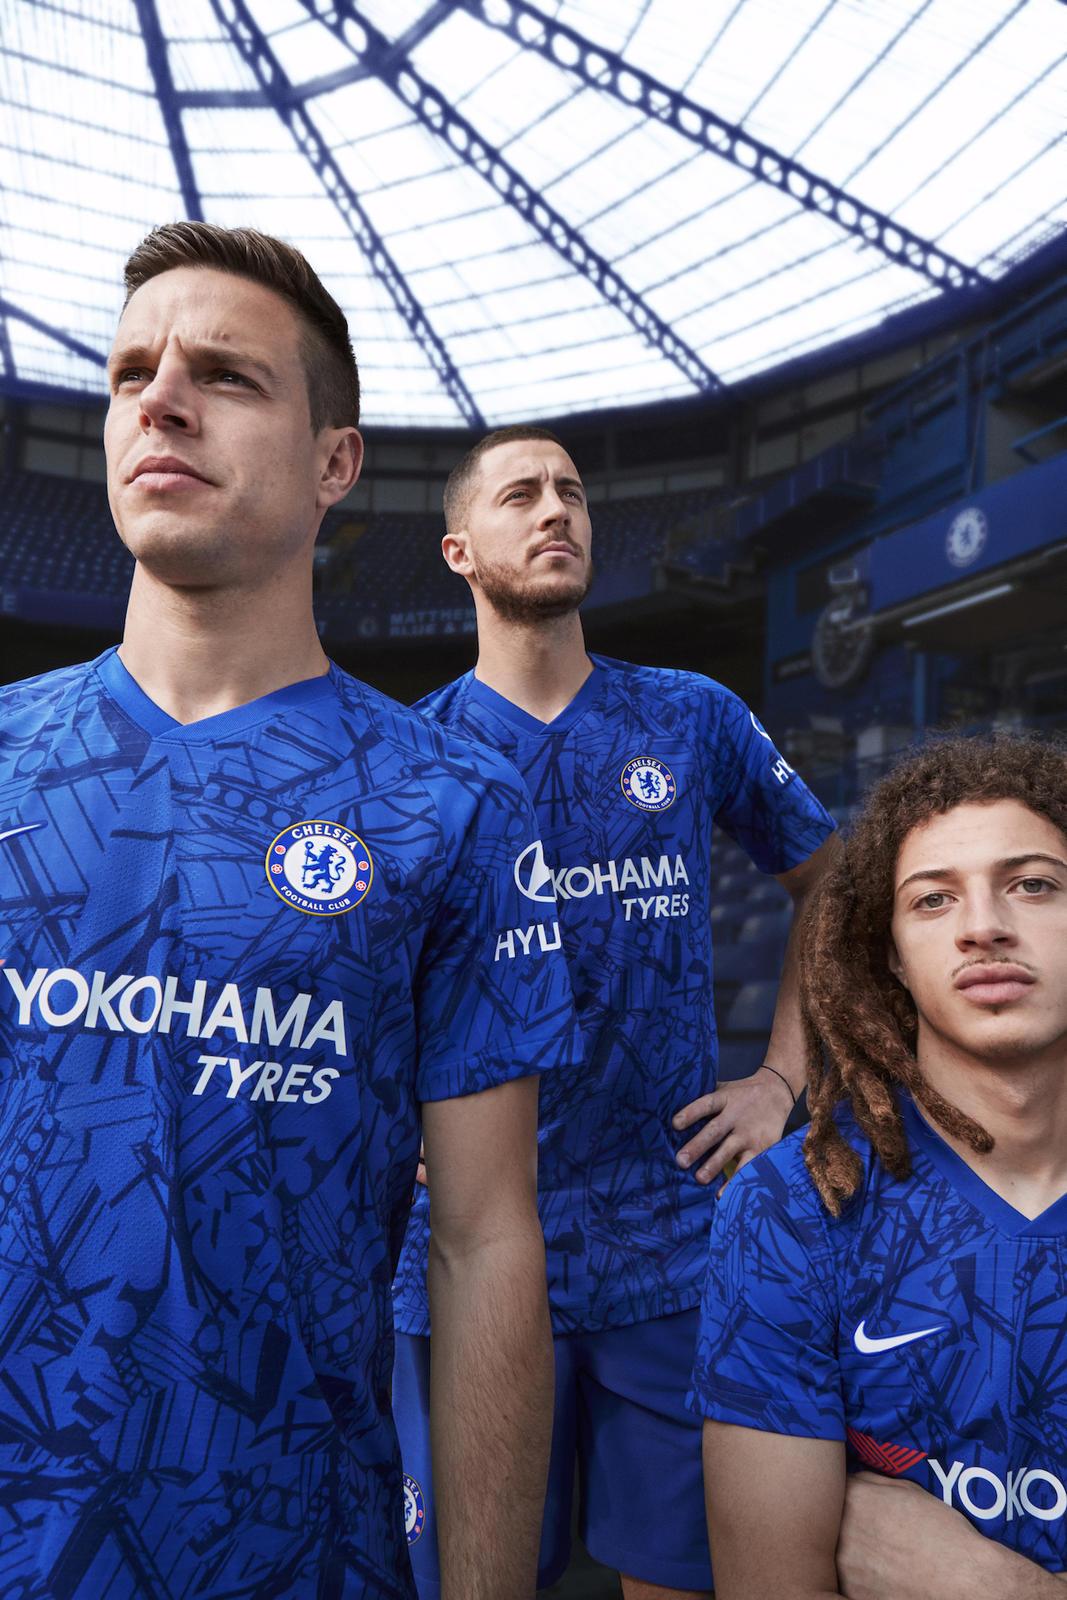 Nike_ChelseaFC_HomeKit_2019-20_7_native_1600.jpg